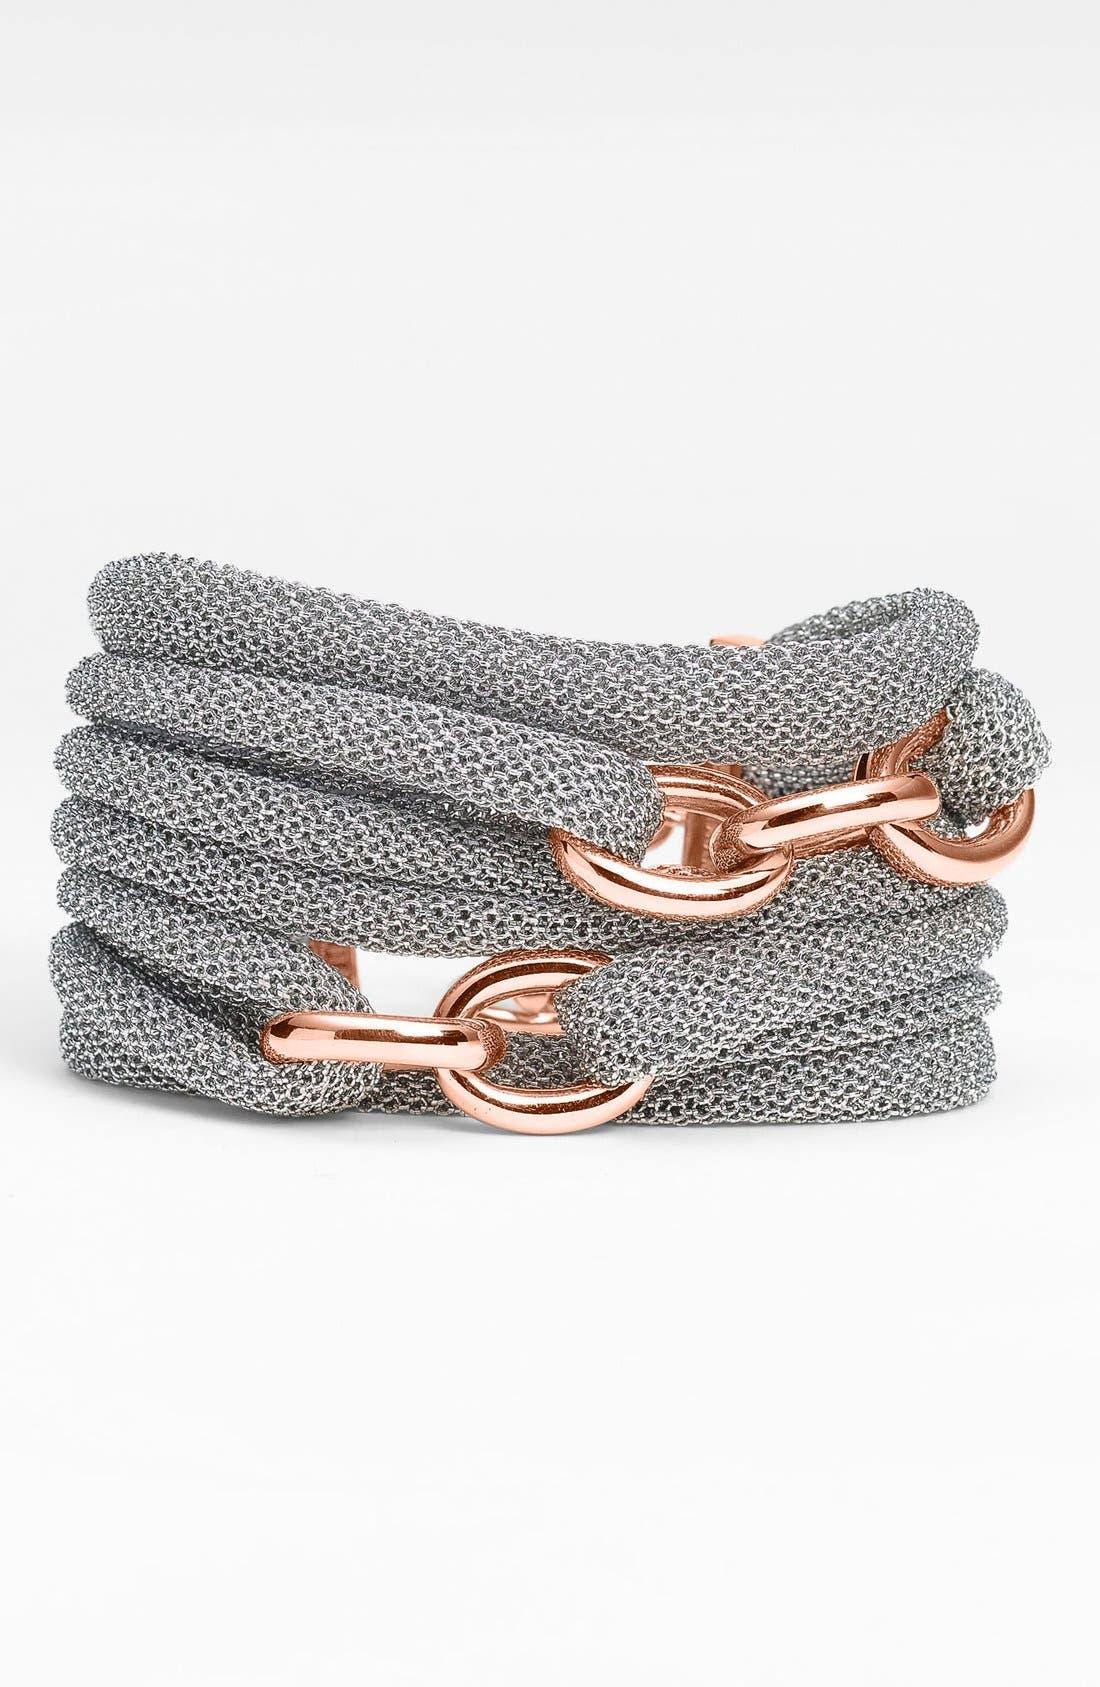 Alternate Image 1 Selected - Adami & Martucci 'Mesh' Line Bracelet (Nordstrom Exclusive)